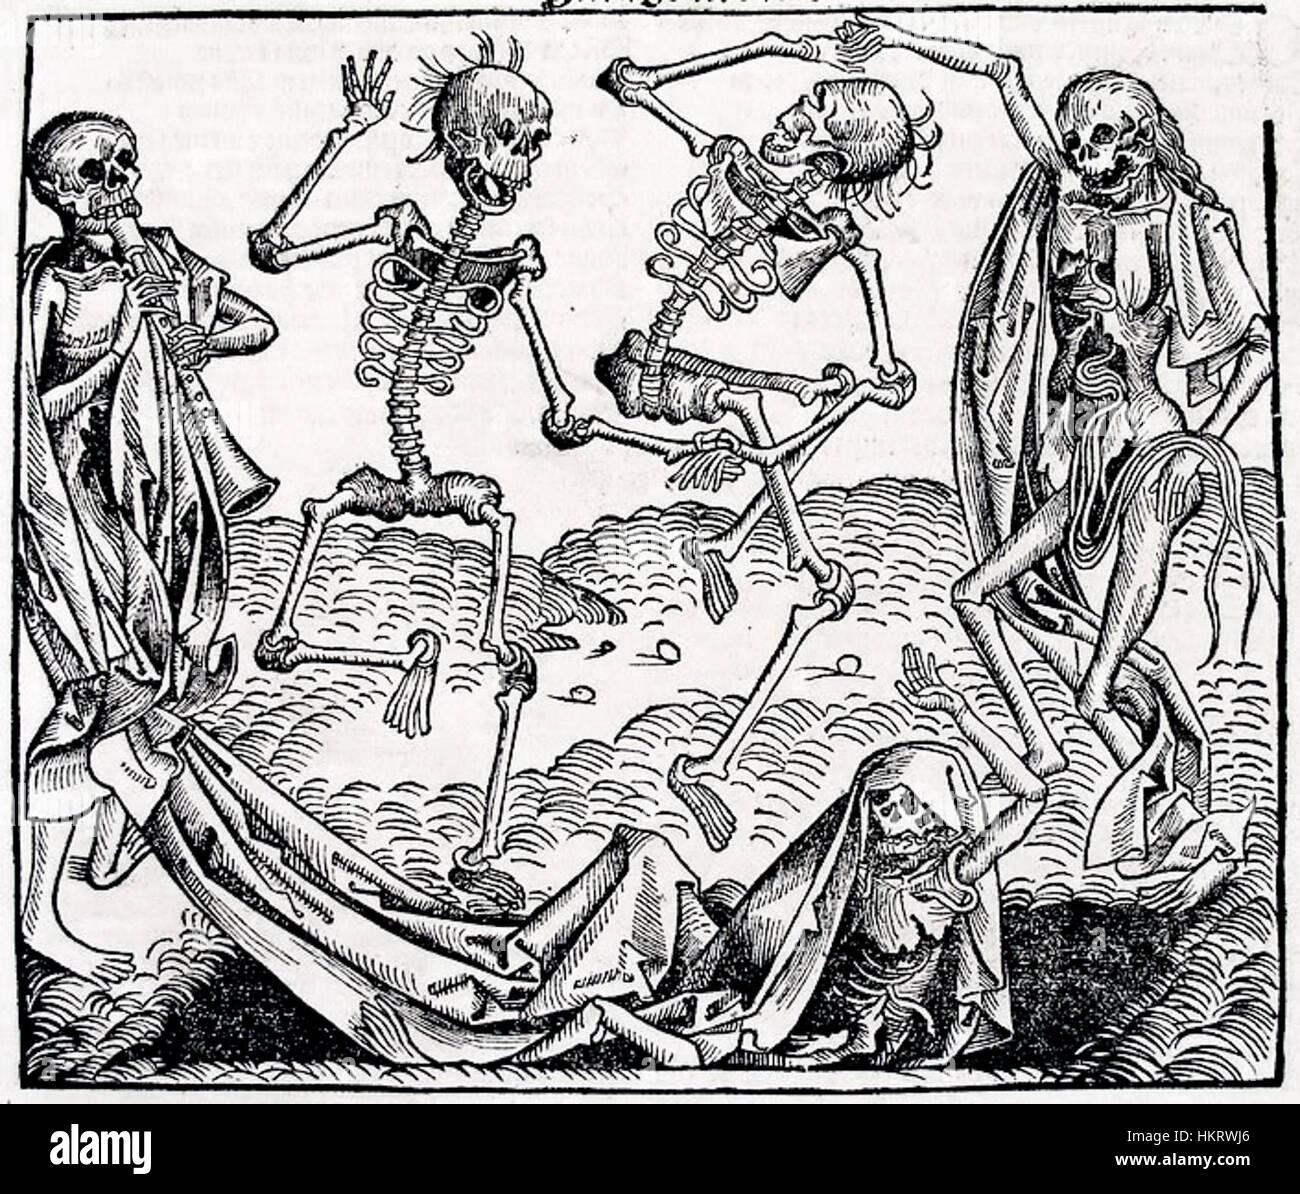 Danse macabre by Michael Wolgemut - Stock Image